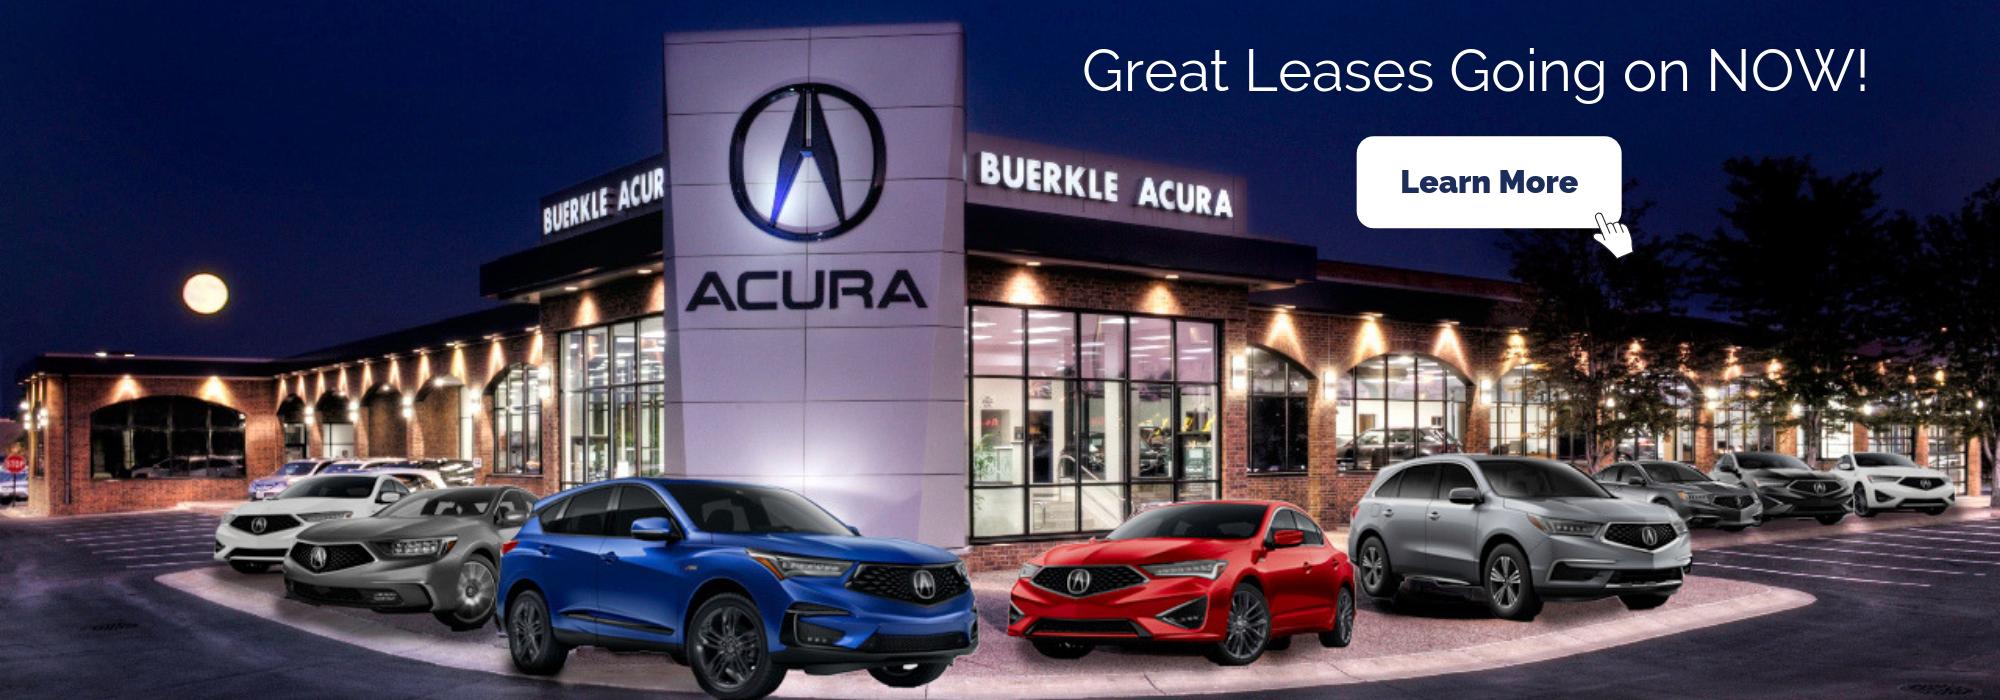 Acura Dealers St Louis >> Buerkle Acura New Used Acura Car Sales In Minneapolis Mn